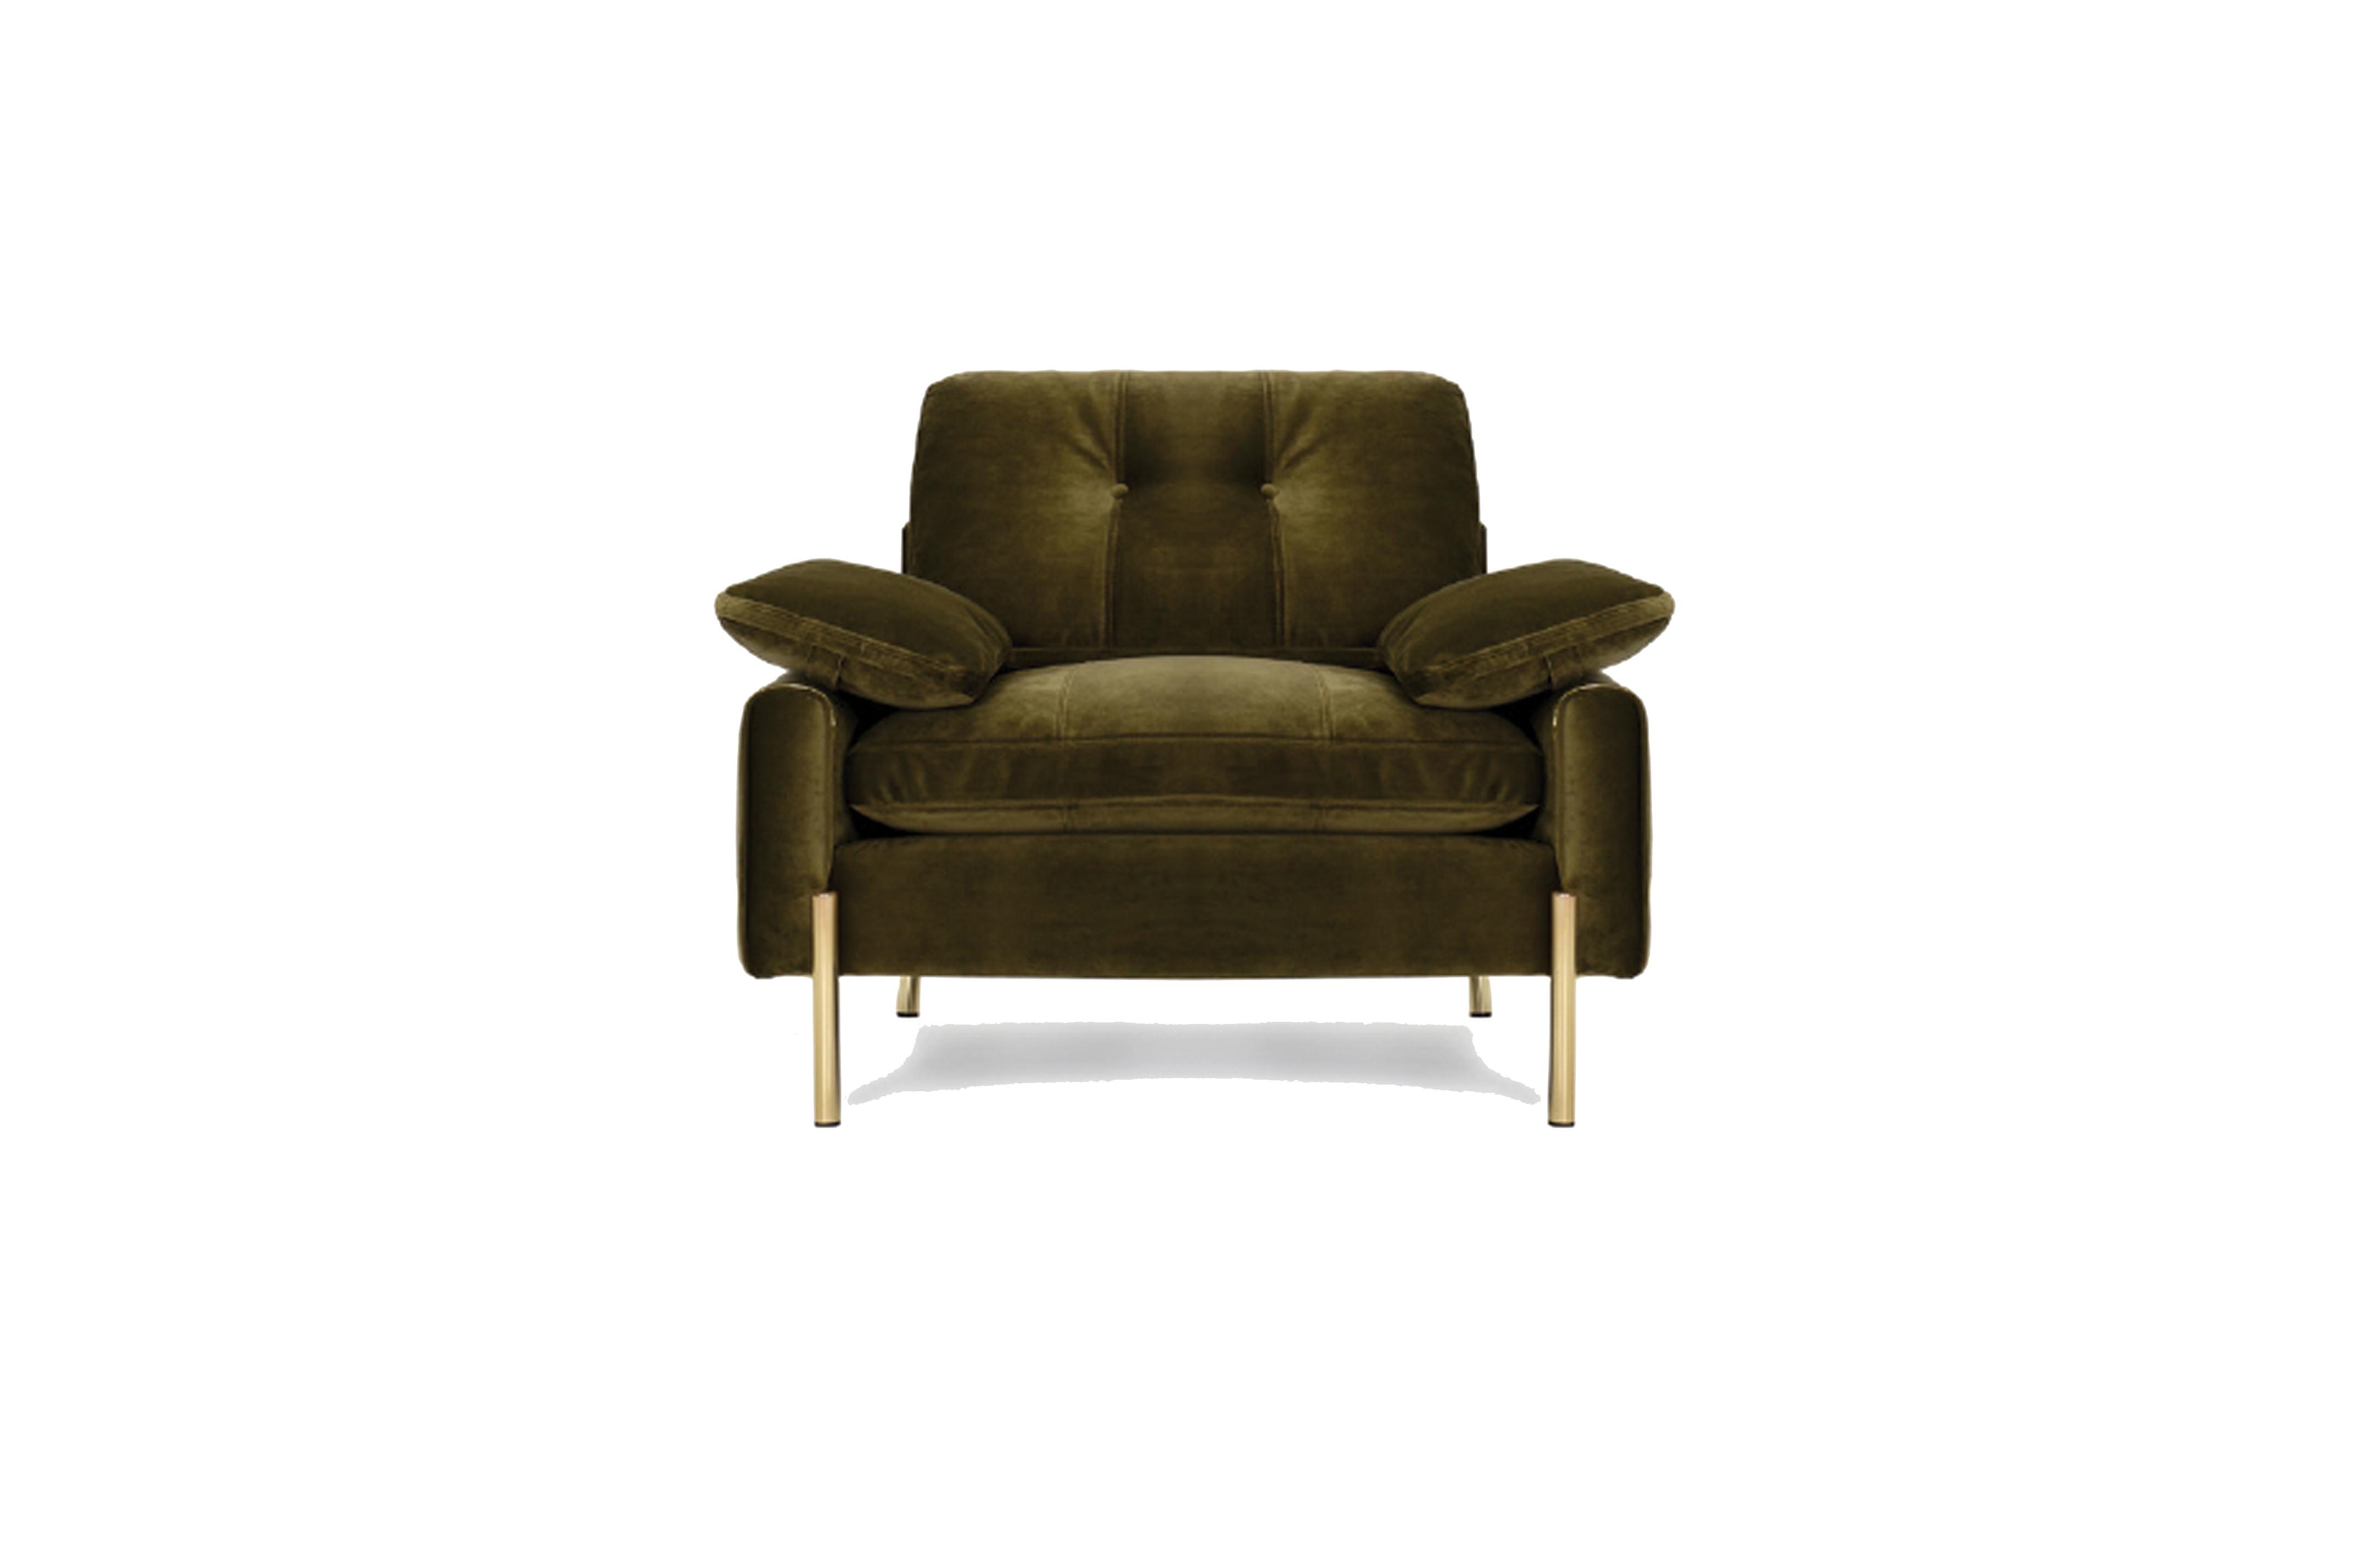 Dudley Standard Chair